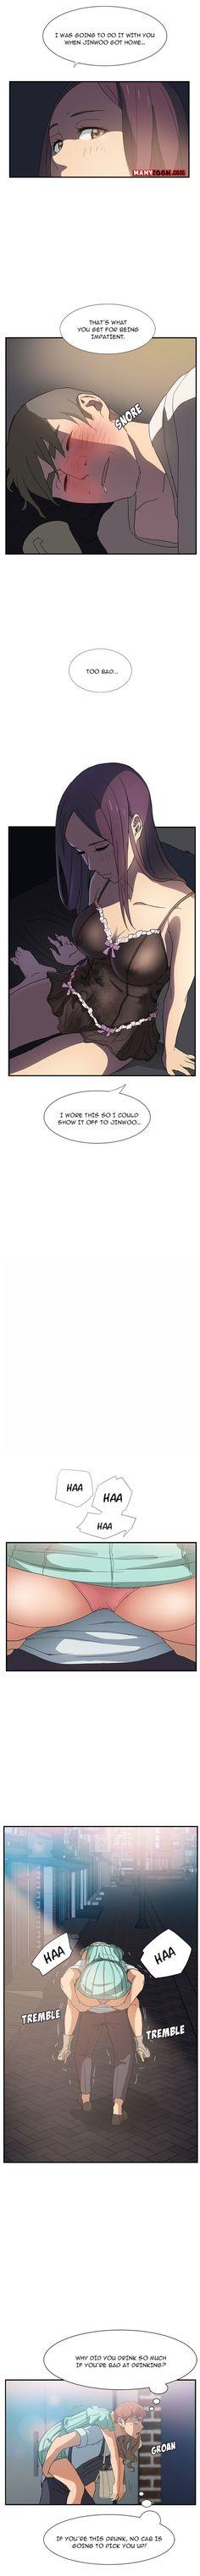 My Stepmom - Adult Comics - Brand new series, Fast loading speed, Fast update - ManyToon - Read Adult Comics Free Online Comics Pdf, Read Comics, My Step Mom, Married Woman, 10 Year Old, Webtoon, Manhwa, Romance, Humor